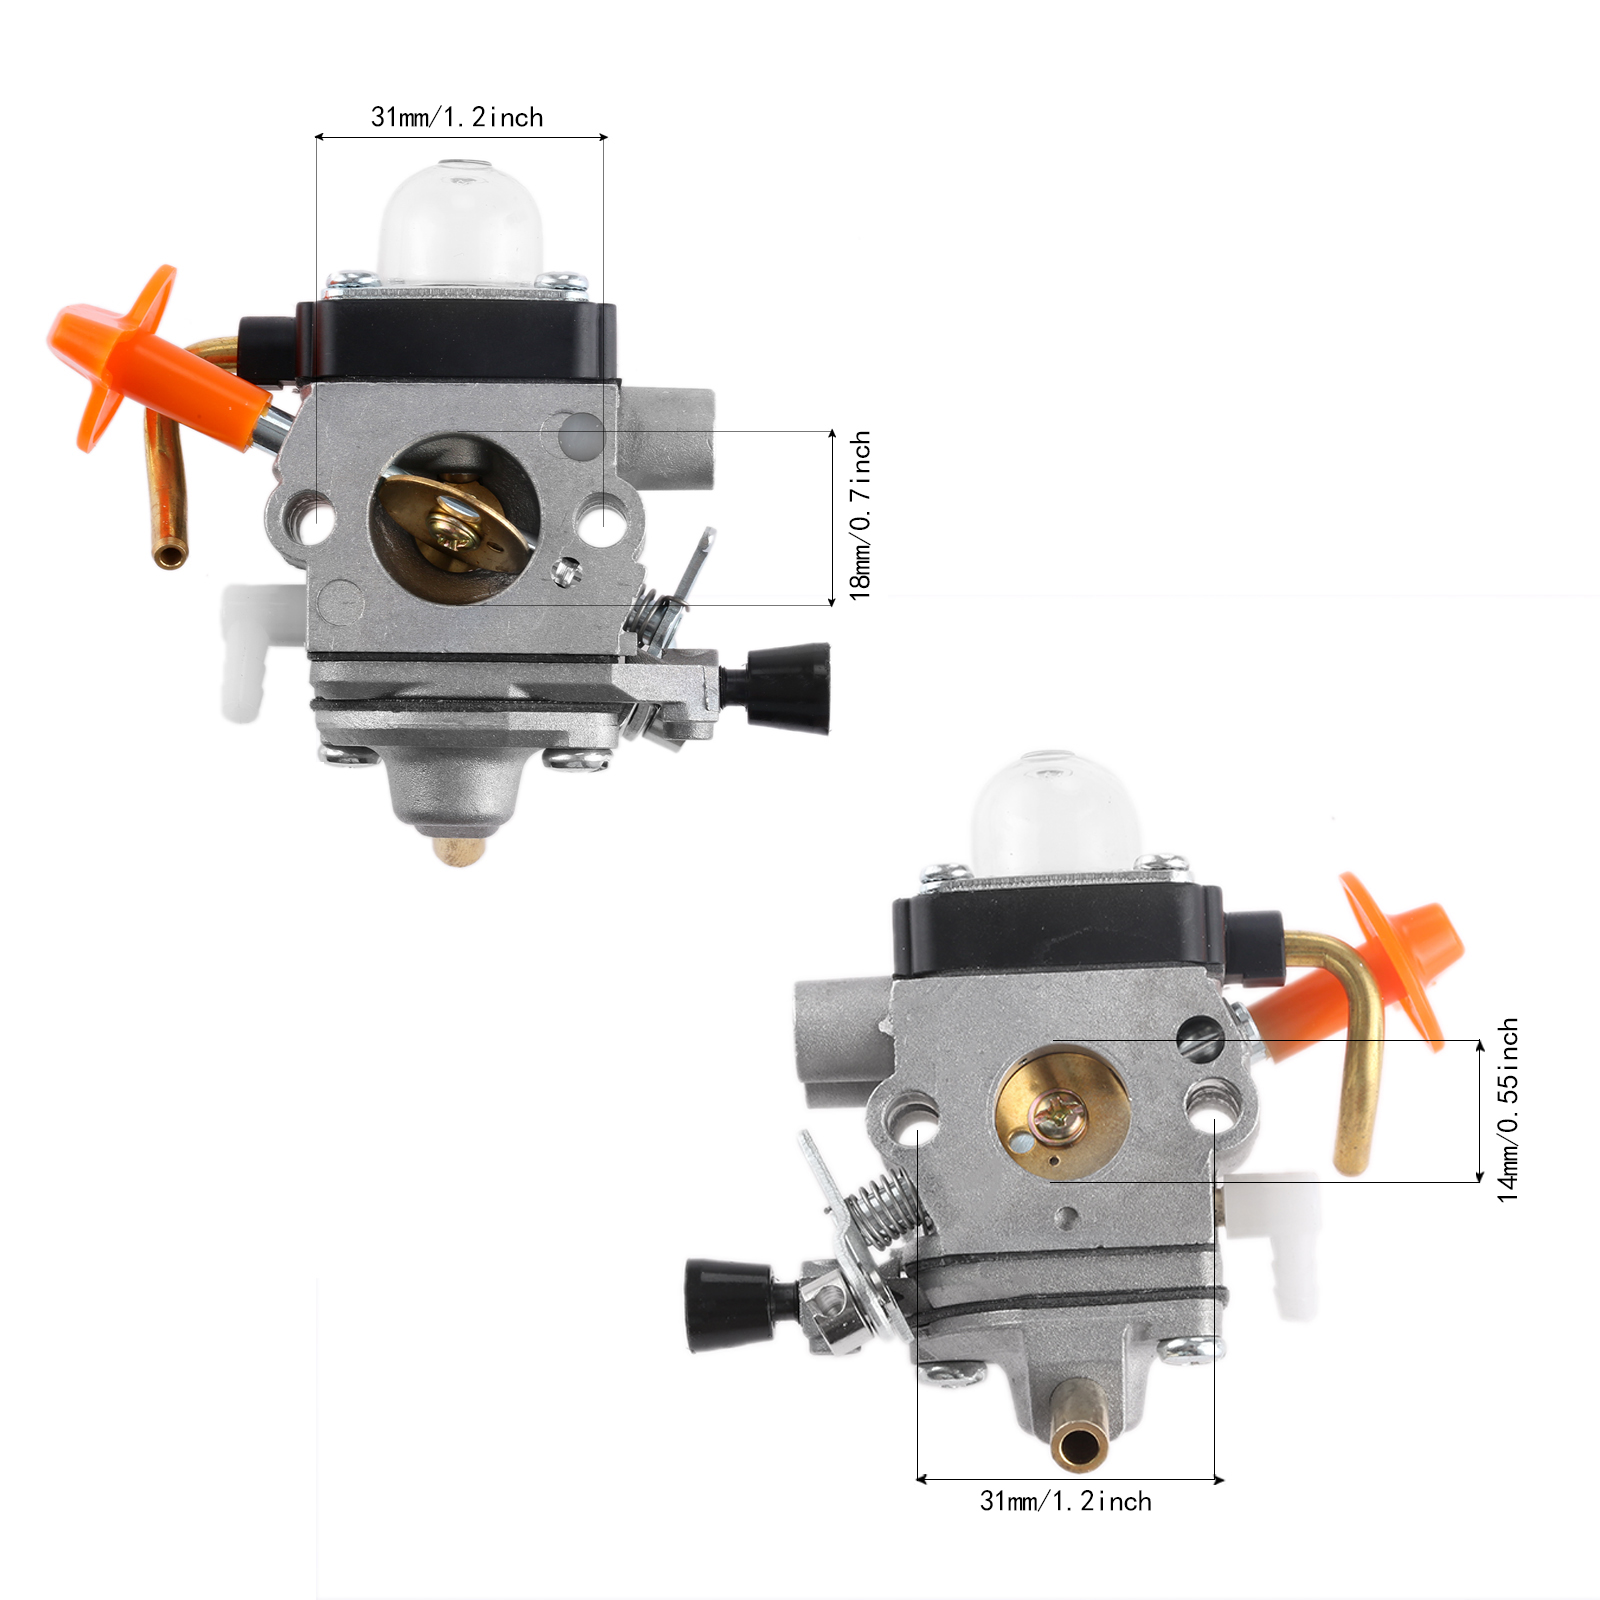 DRELD Carburetor Carb For Stihl FS87 FS90 FS100 KM100 FS110 KM110 FS130 KM130 HT130 Trimmer Engine Spare Part ZAMA C1Q-S173 S174